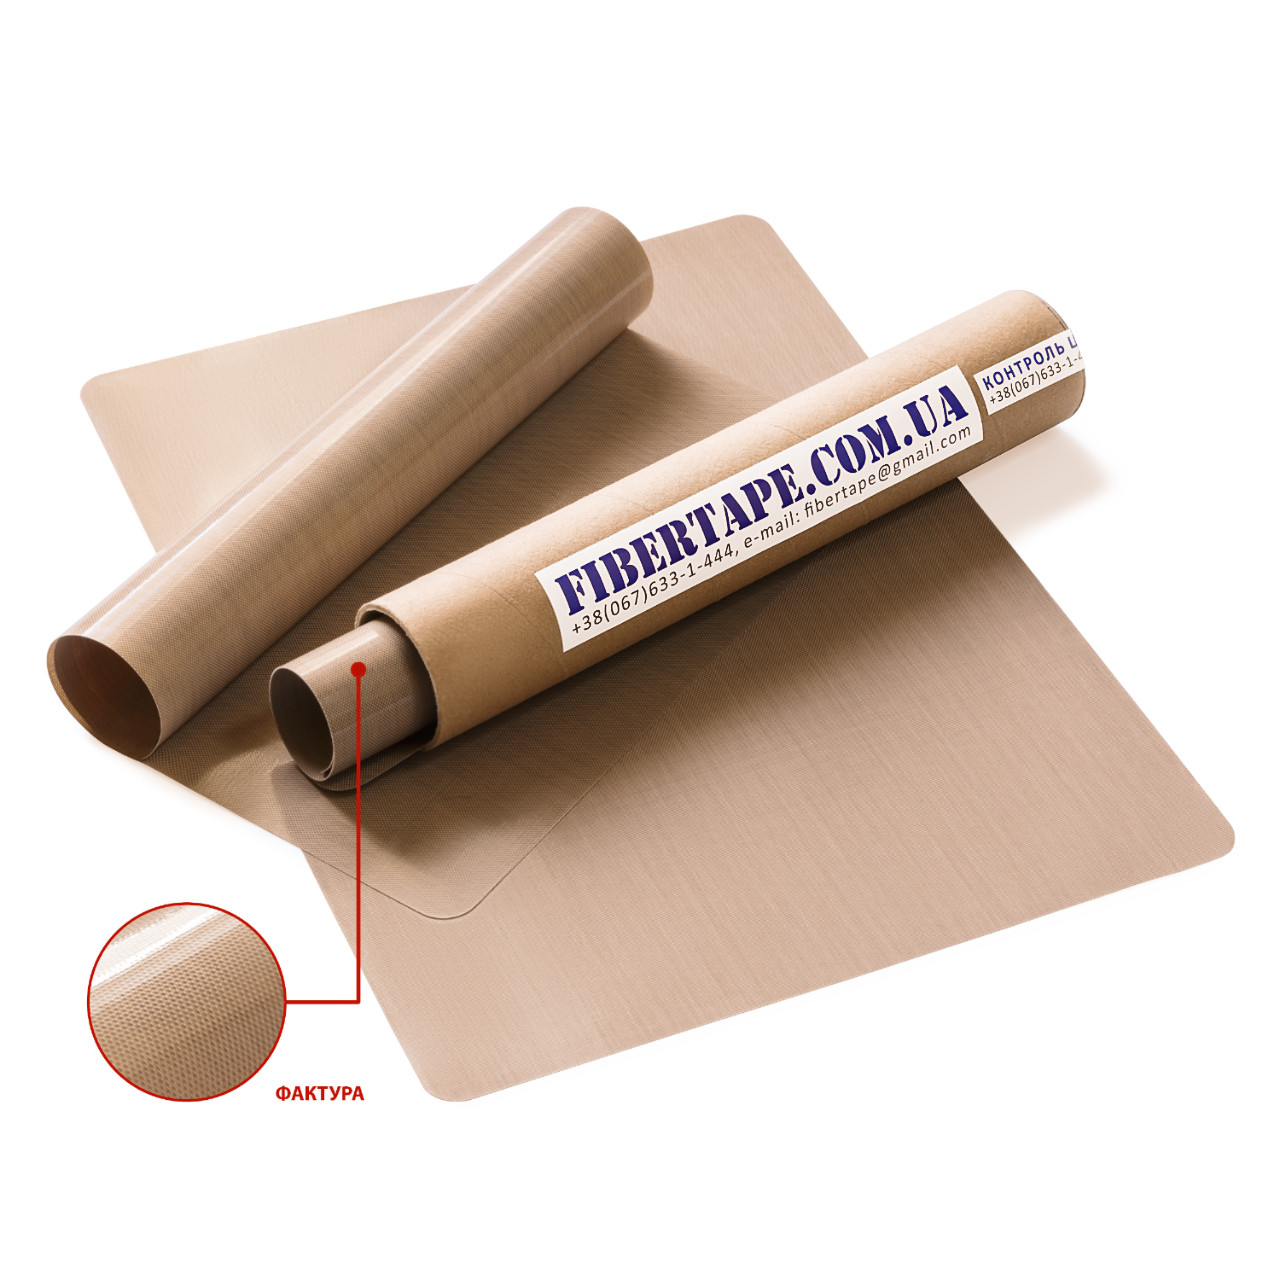 Тефлоновый коврик 30х40 см 0,5 мм для выпечки